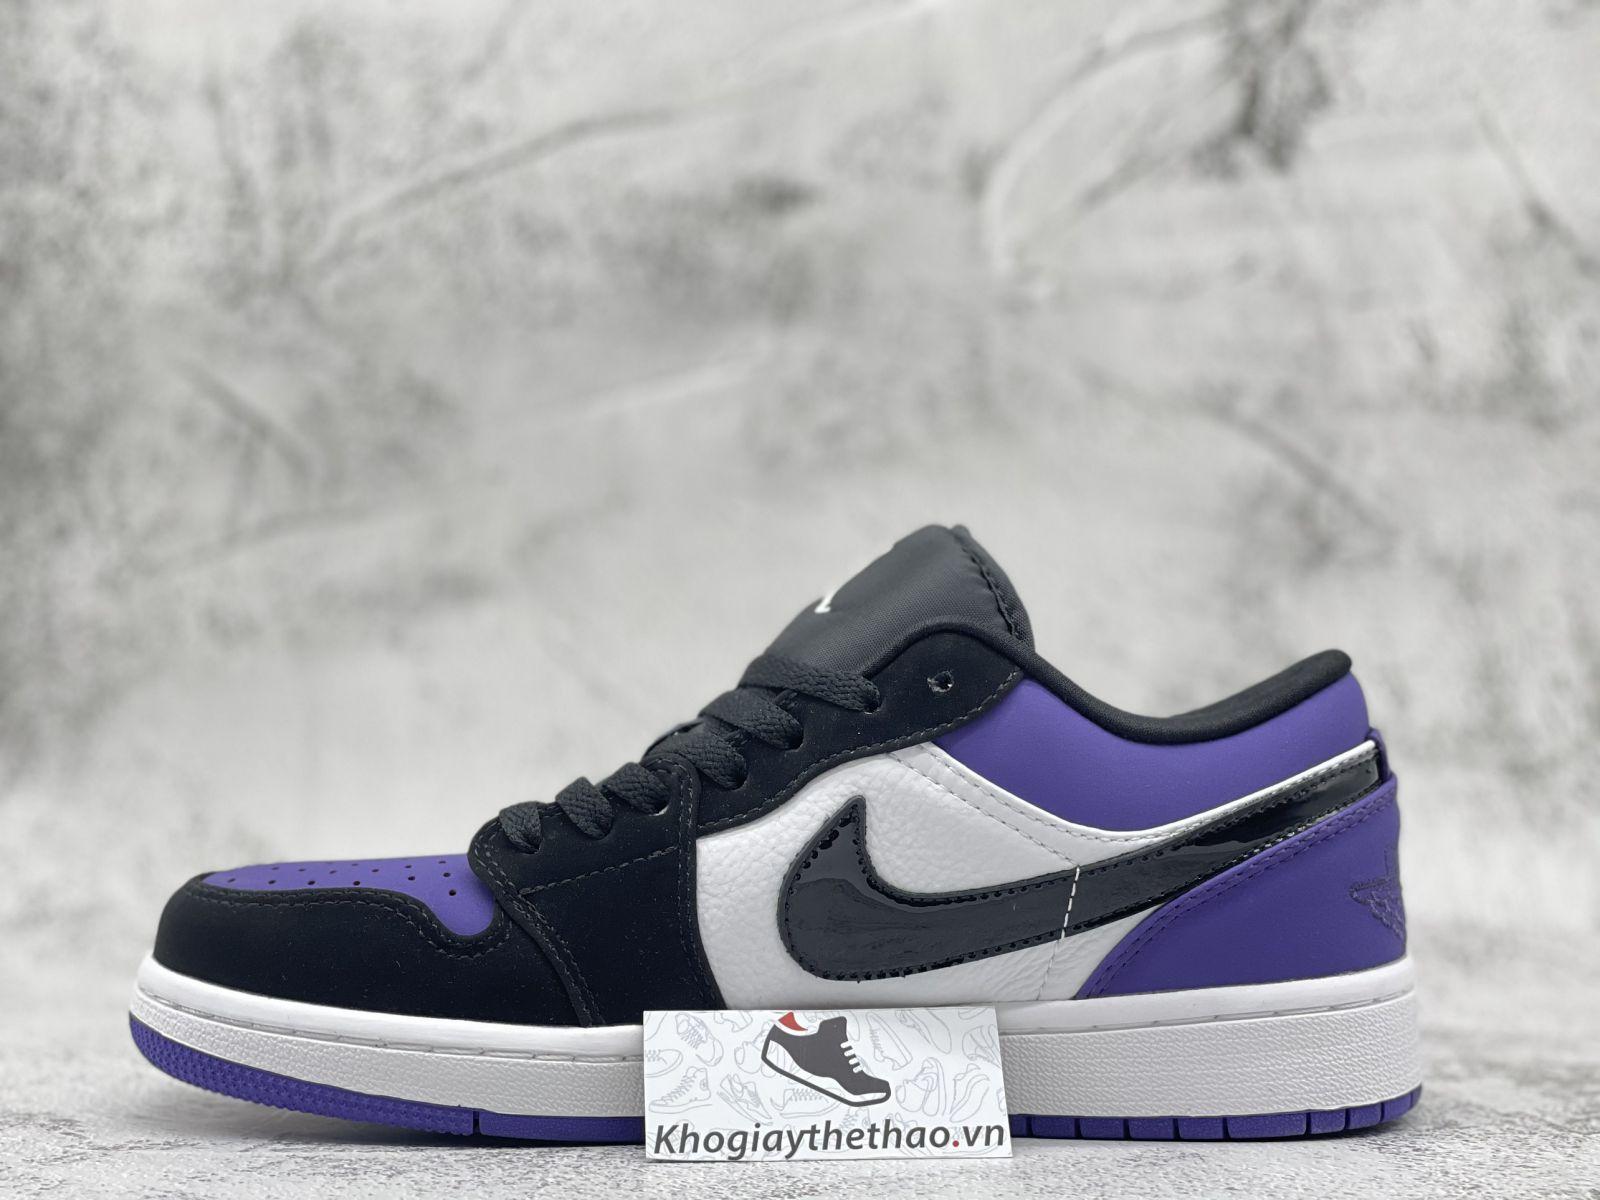 Giày Nike Air Jordan 1 Low 'Court' Purple Black